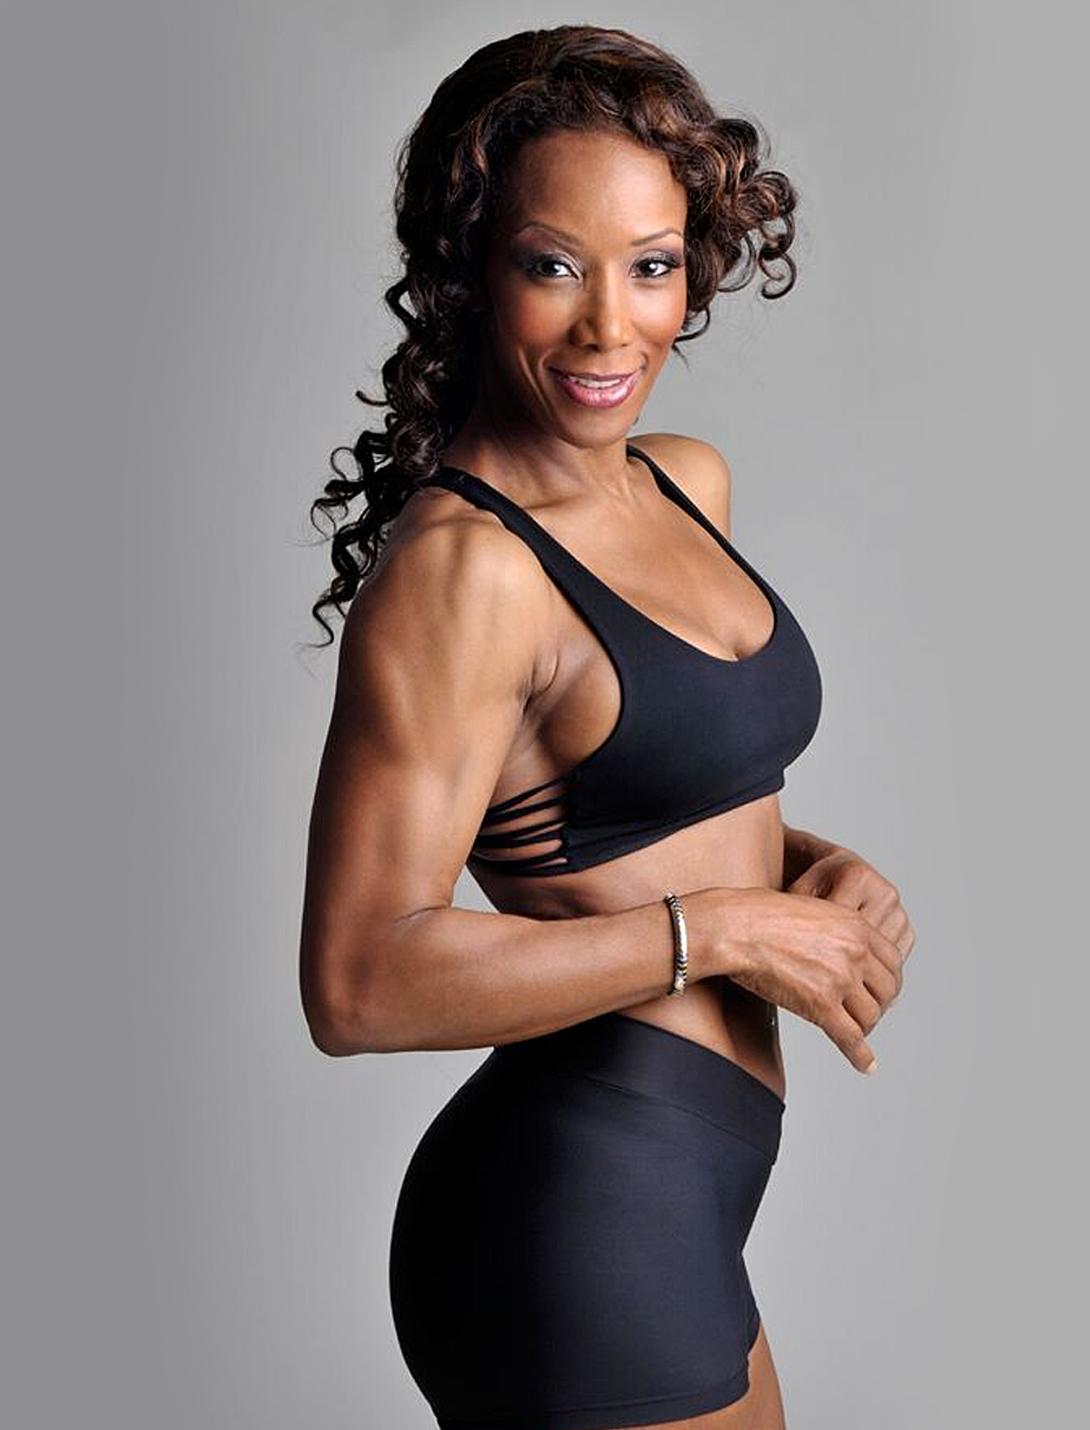 Wendy Ida - Fit Women Over 50